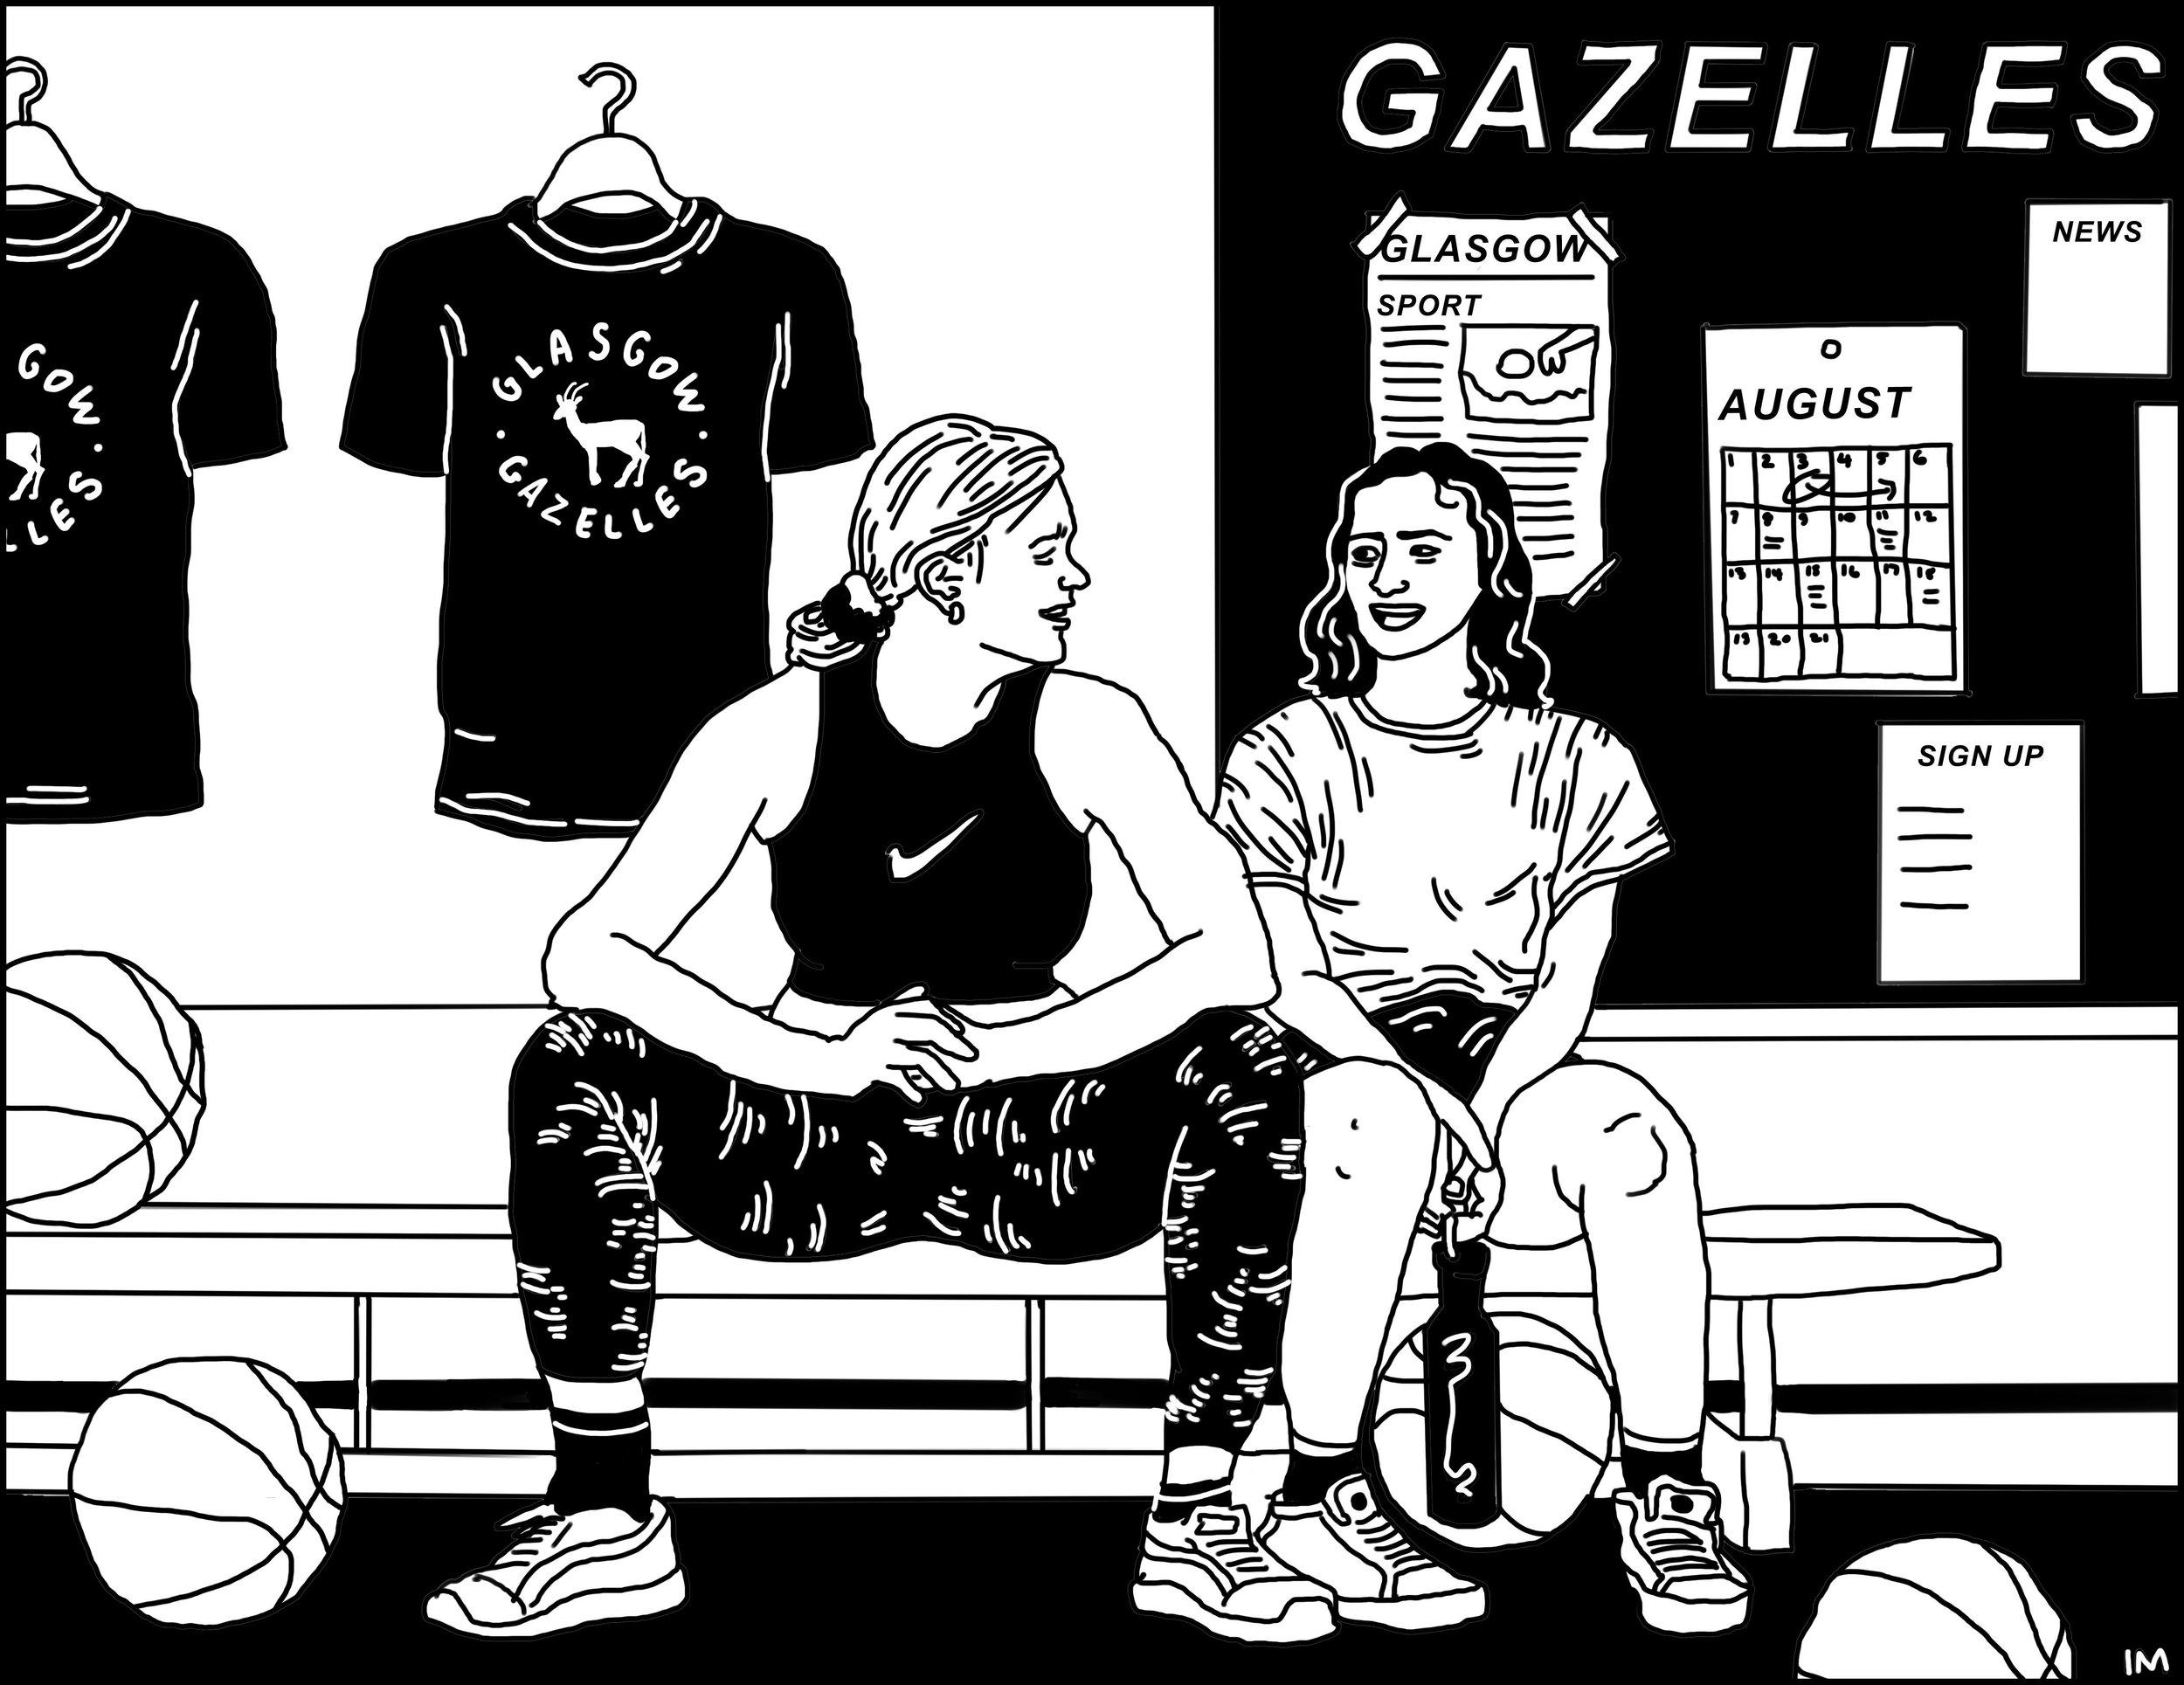 Glasgow Gazelles, Cred: Illustration by  @belmehta